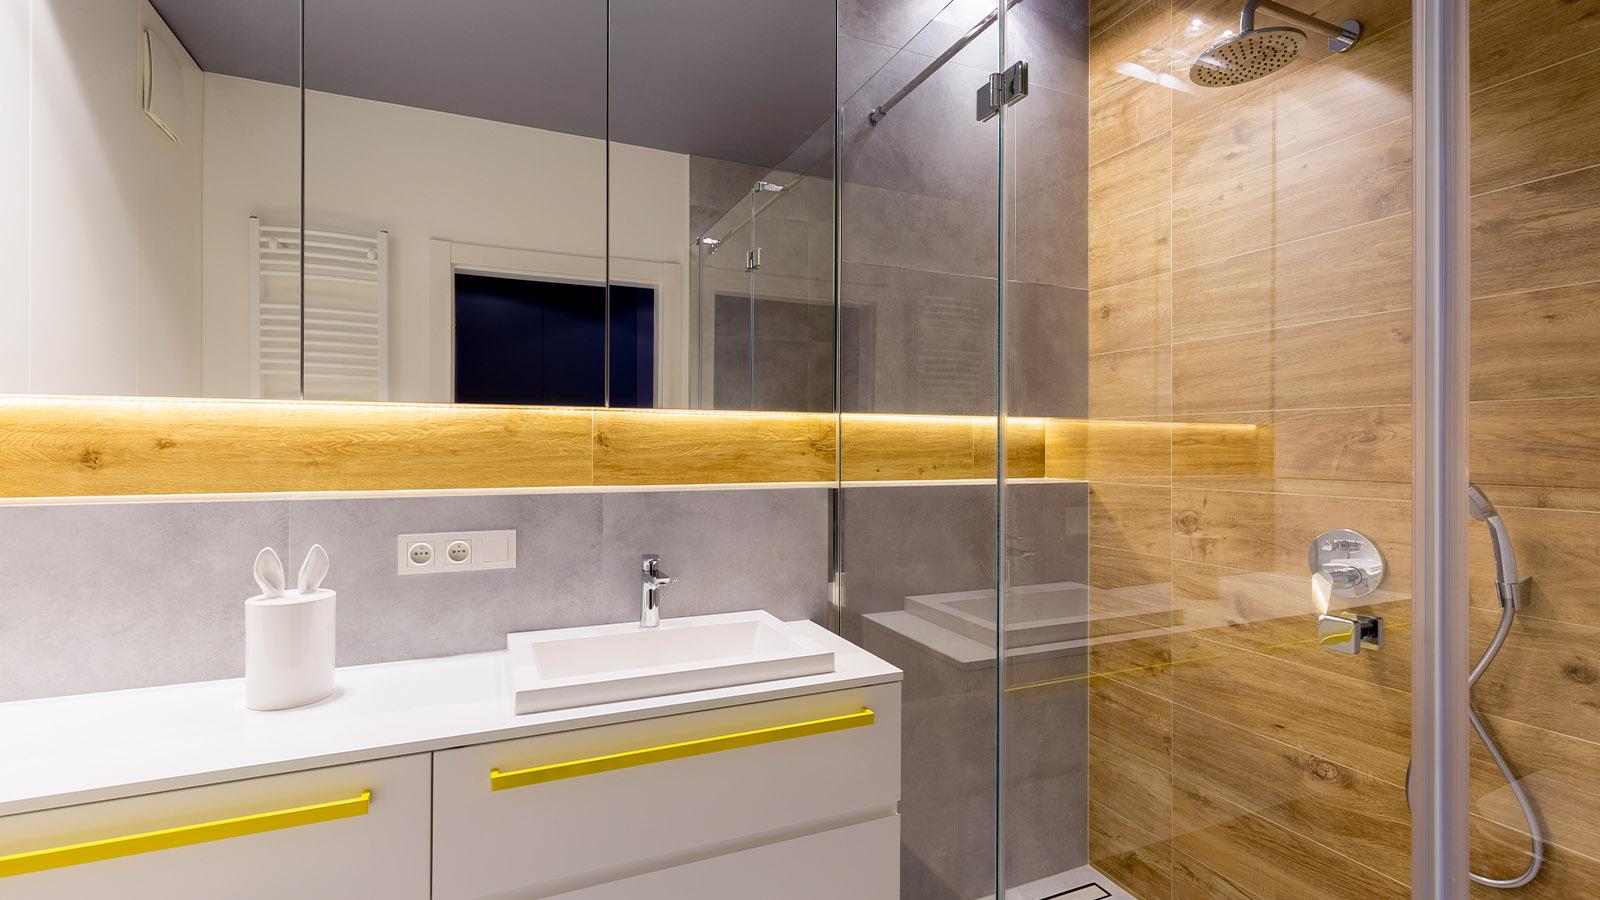 Duschtür in modernem Bad